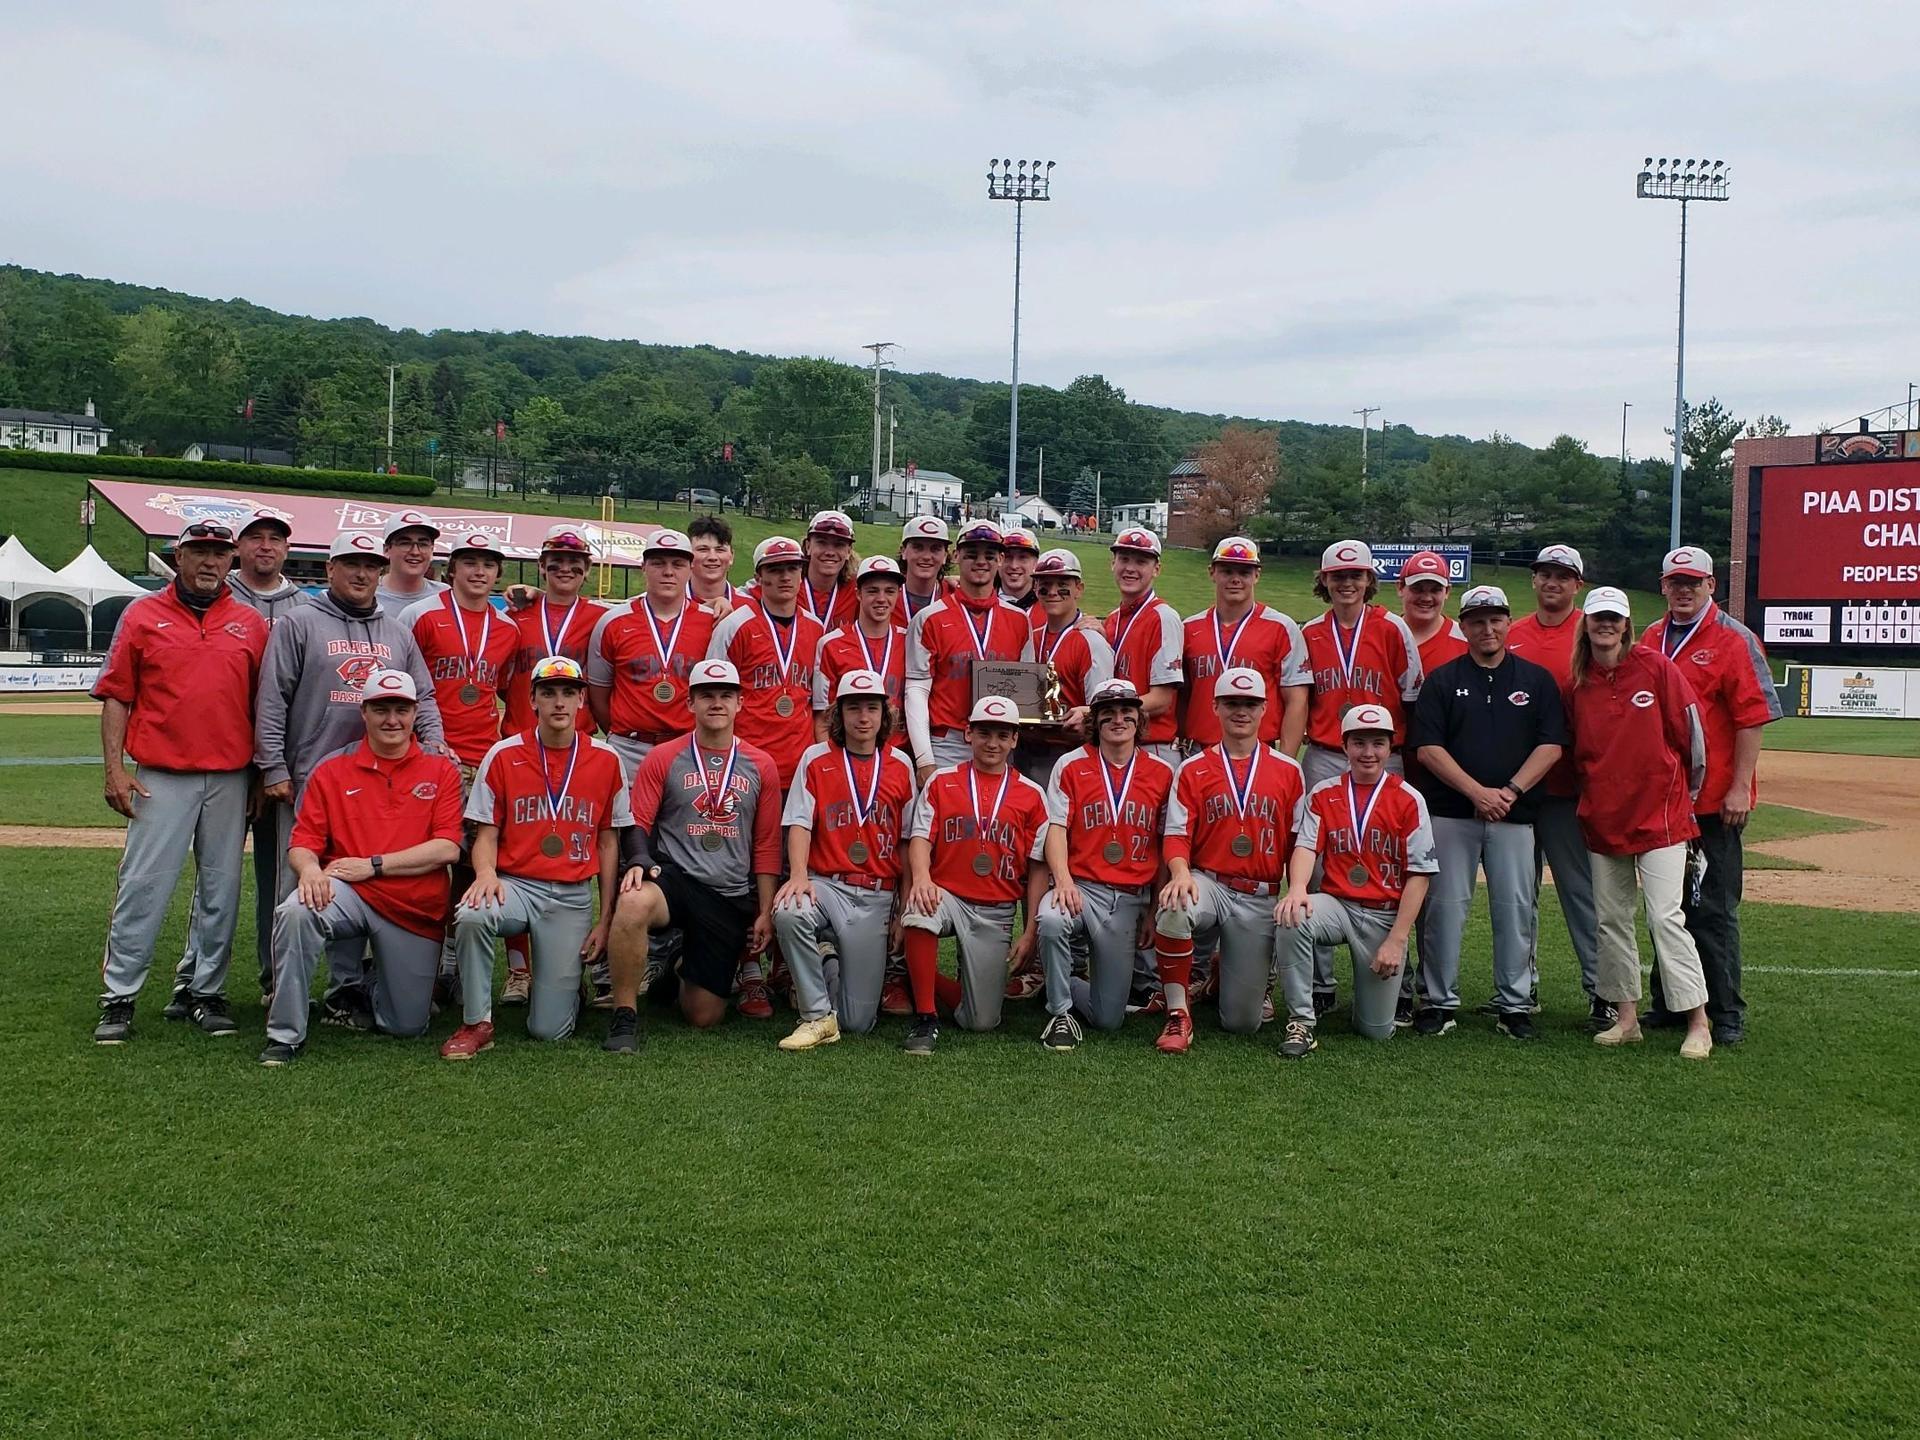 2021 District 6 3A Baseball Champions 6.2.21